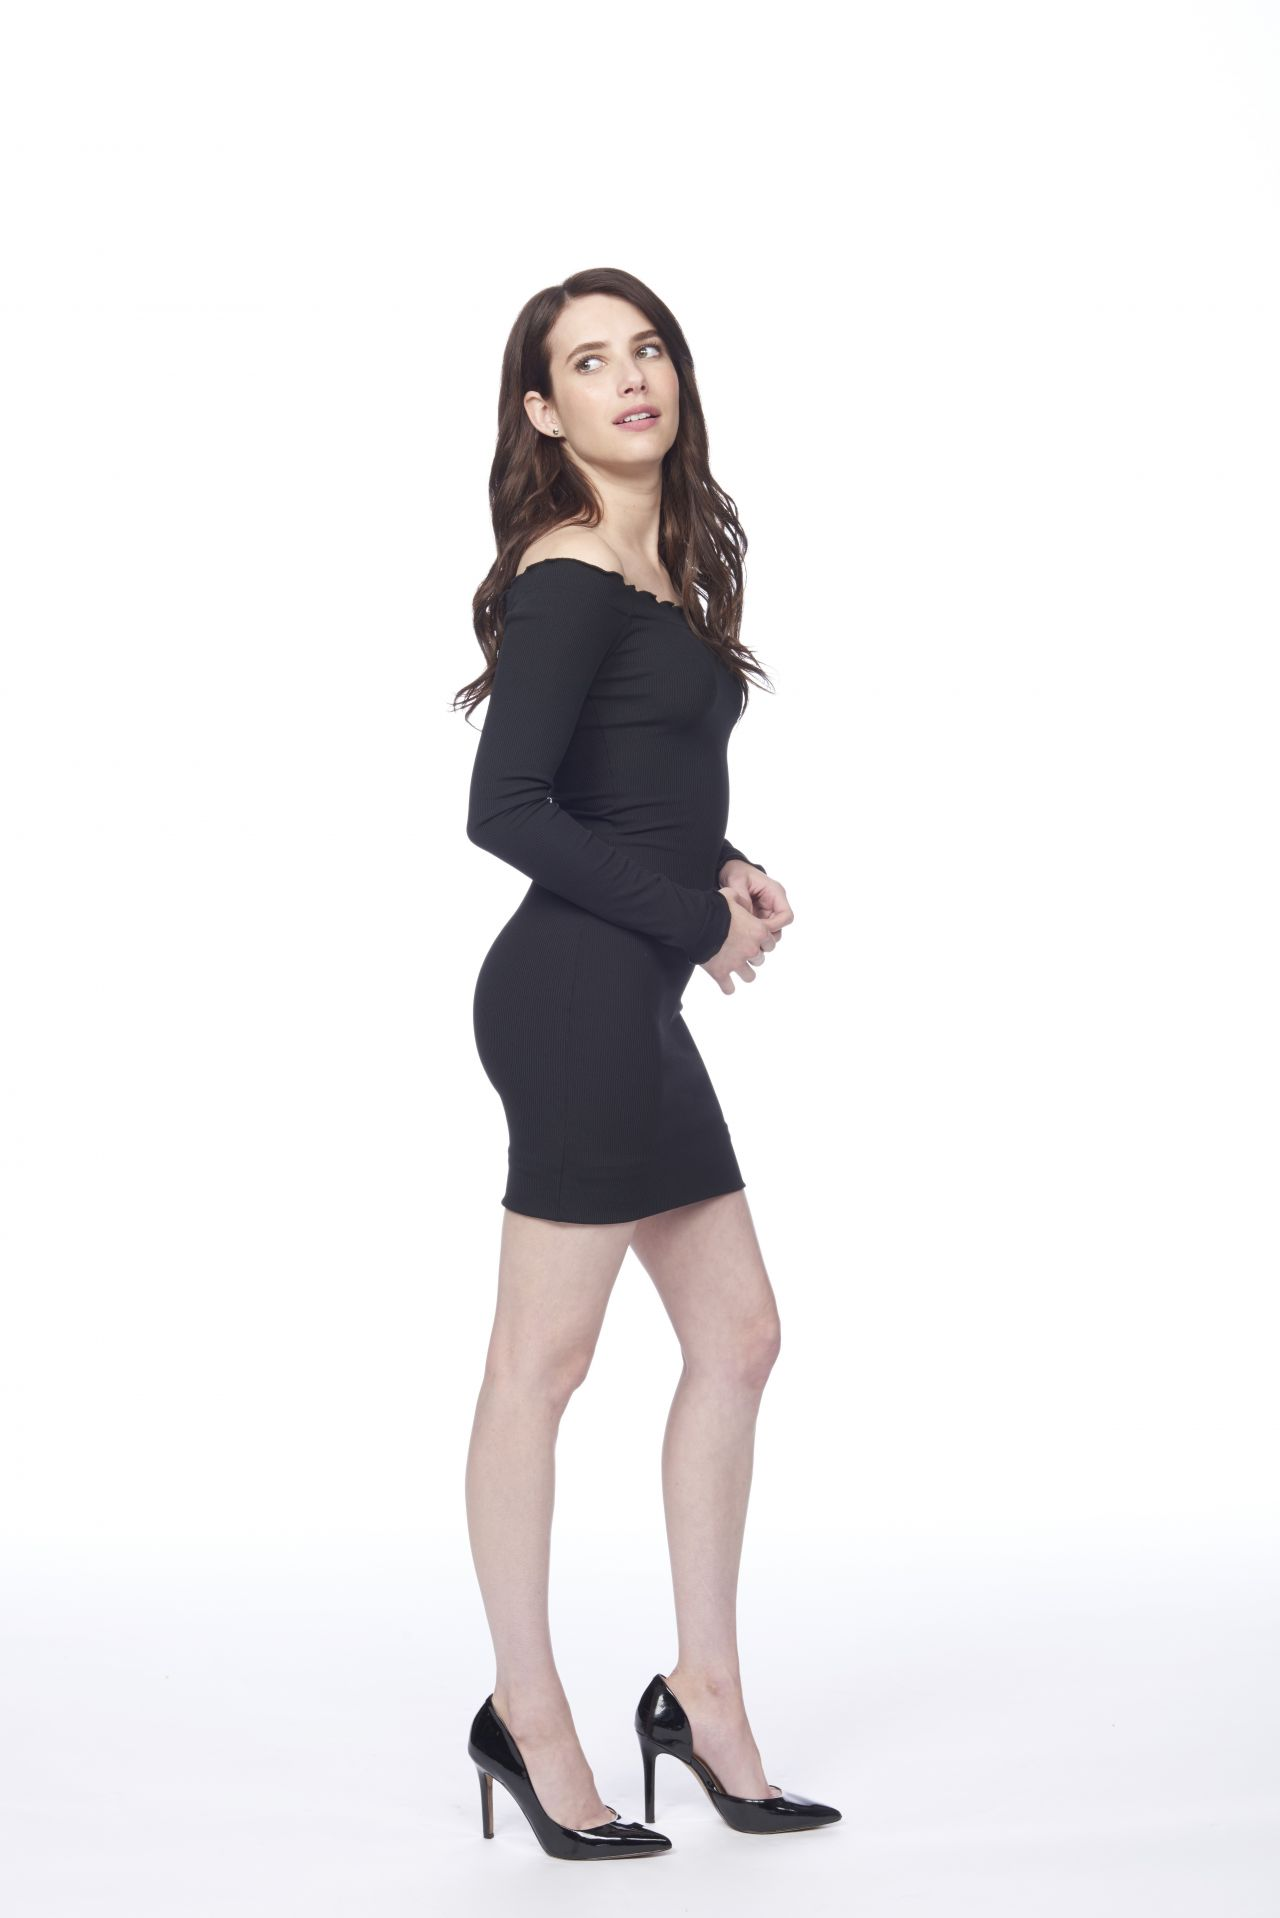 https://celebmafia.com/wp-content/uploads/2018/10/emma-roberts-little-italy-promoshoot-0.jpg